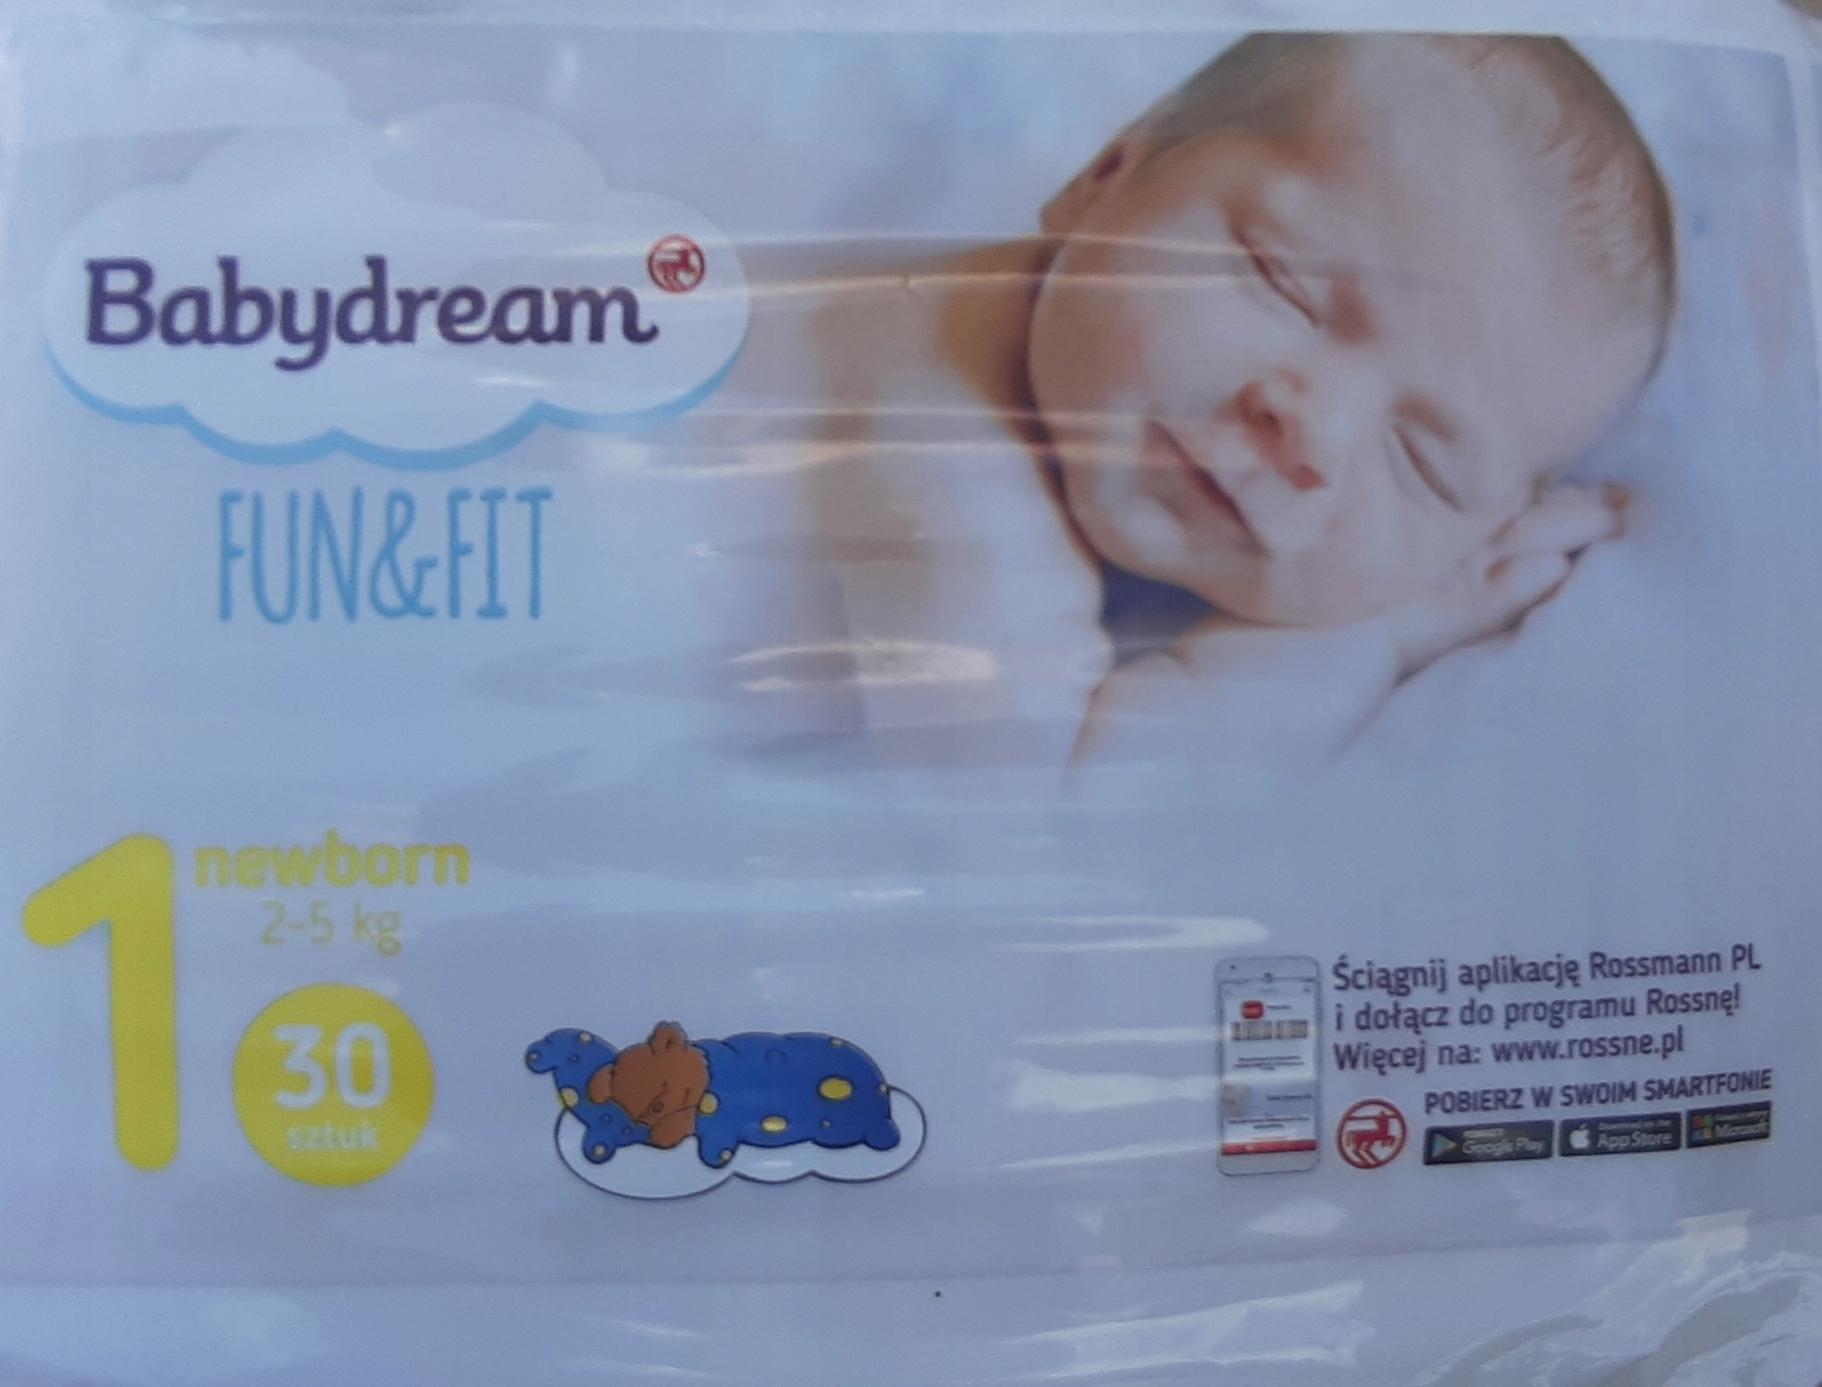 Babydream Fun Fit размер 1 (2,5 кг) 30 шт.